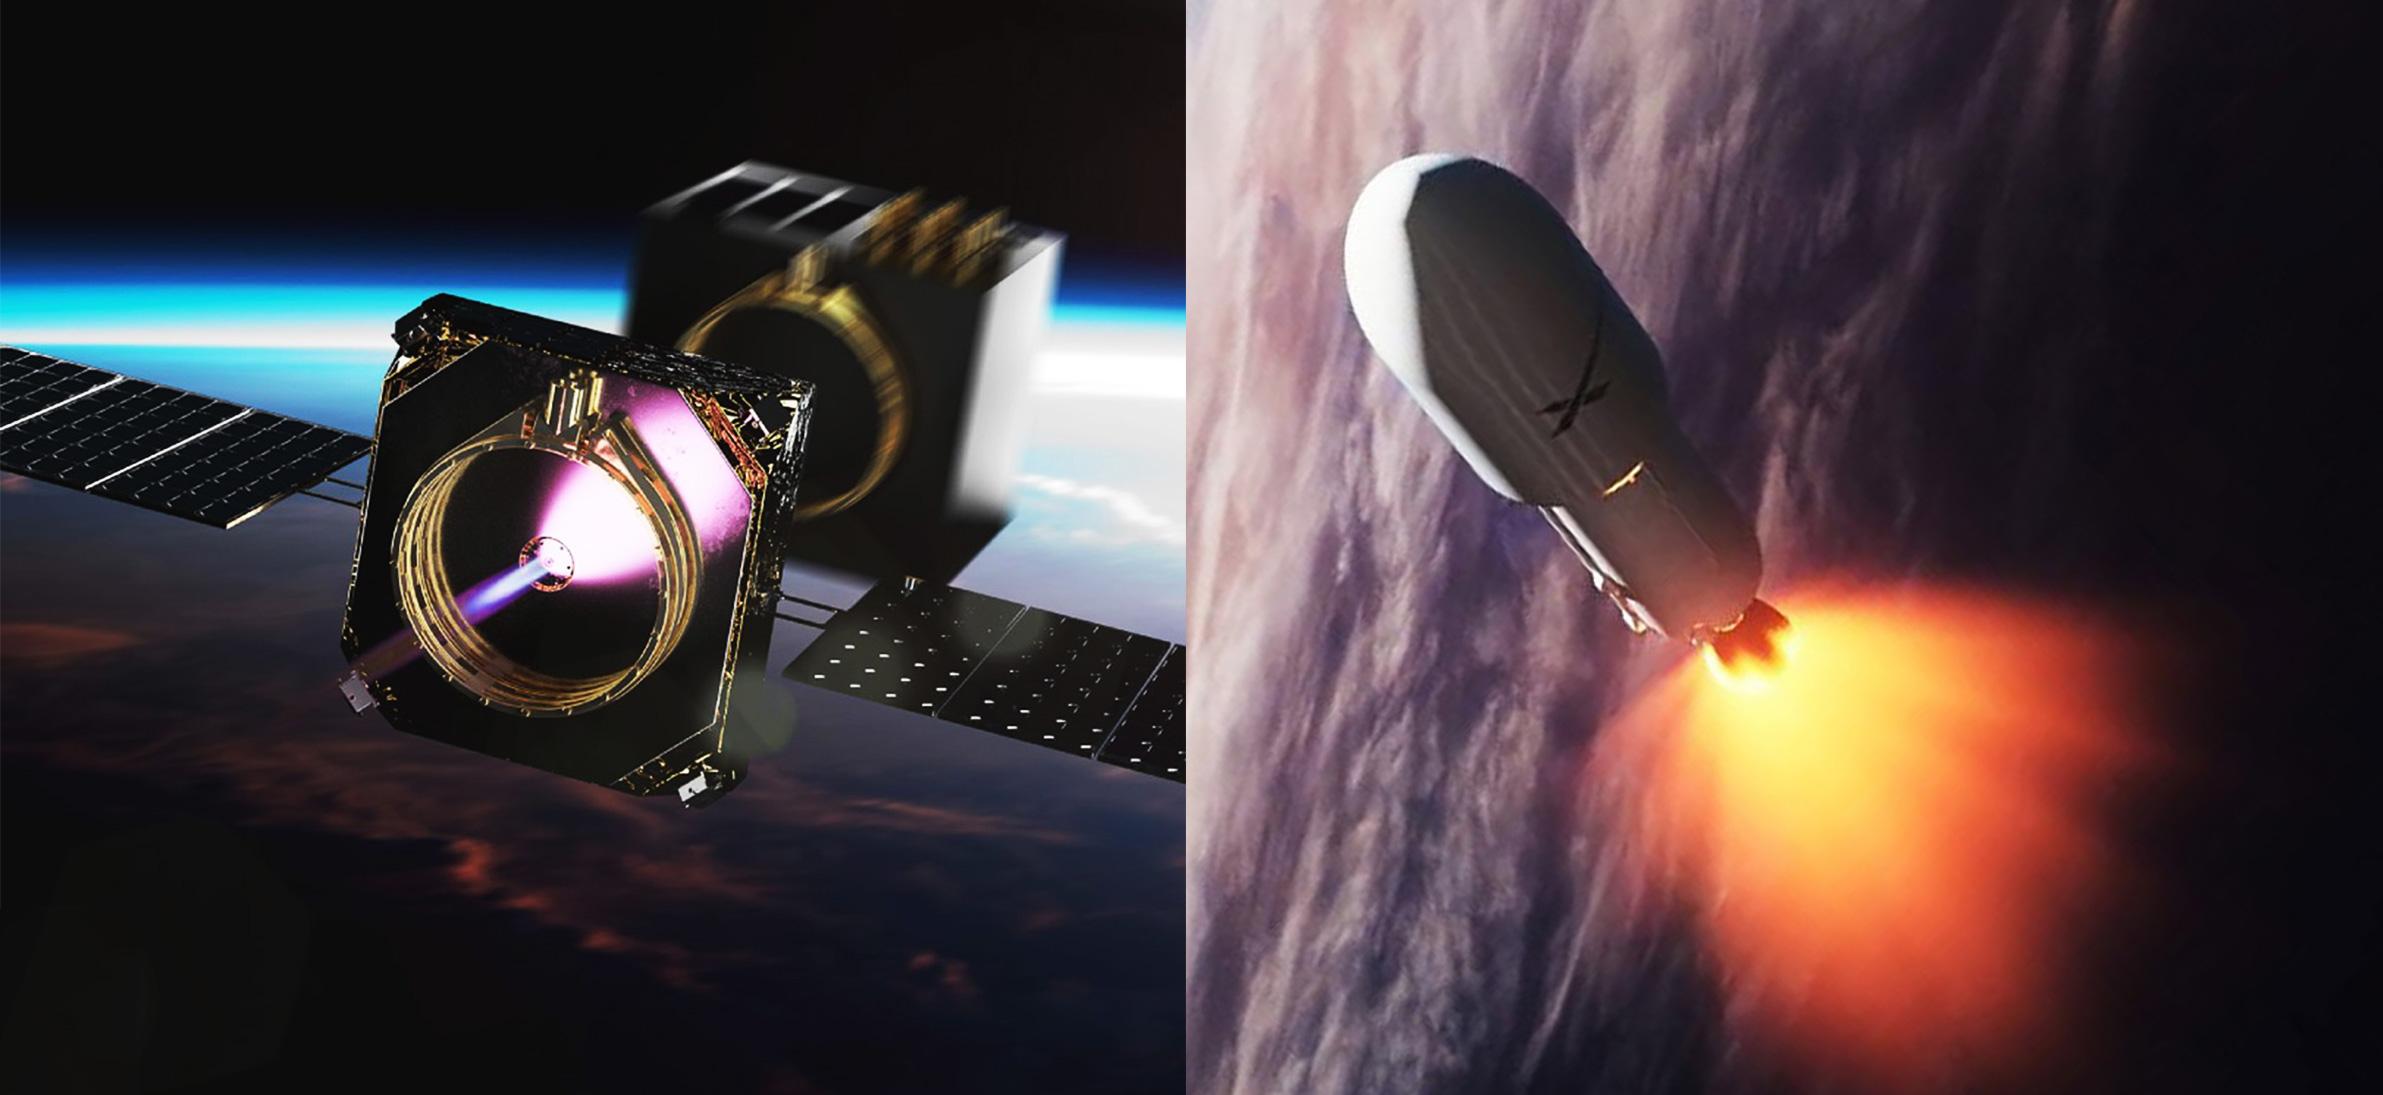 Falcon 9 smallsat rideshare & Momentus Vigoride (SpaceX – Momentus) 1